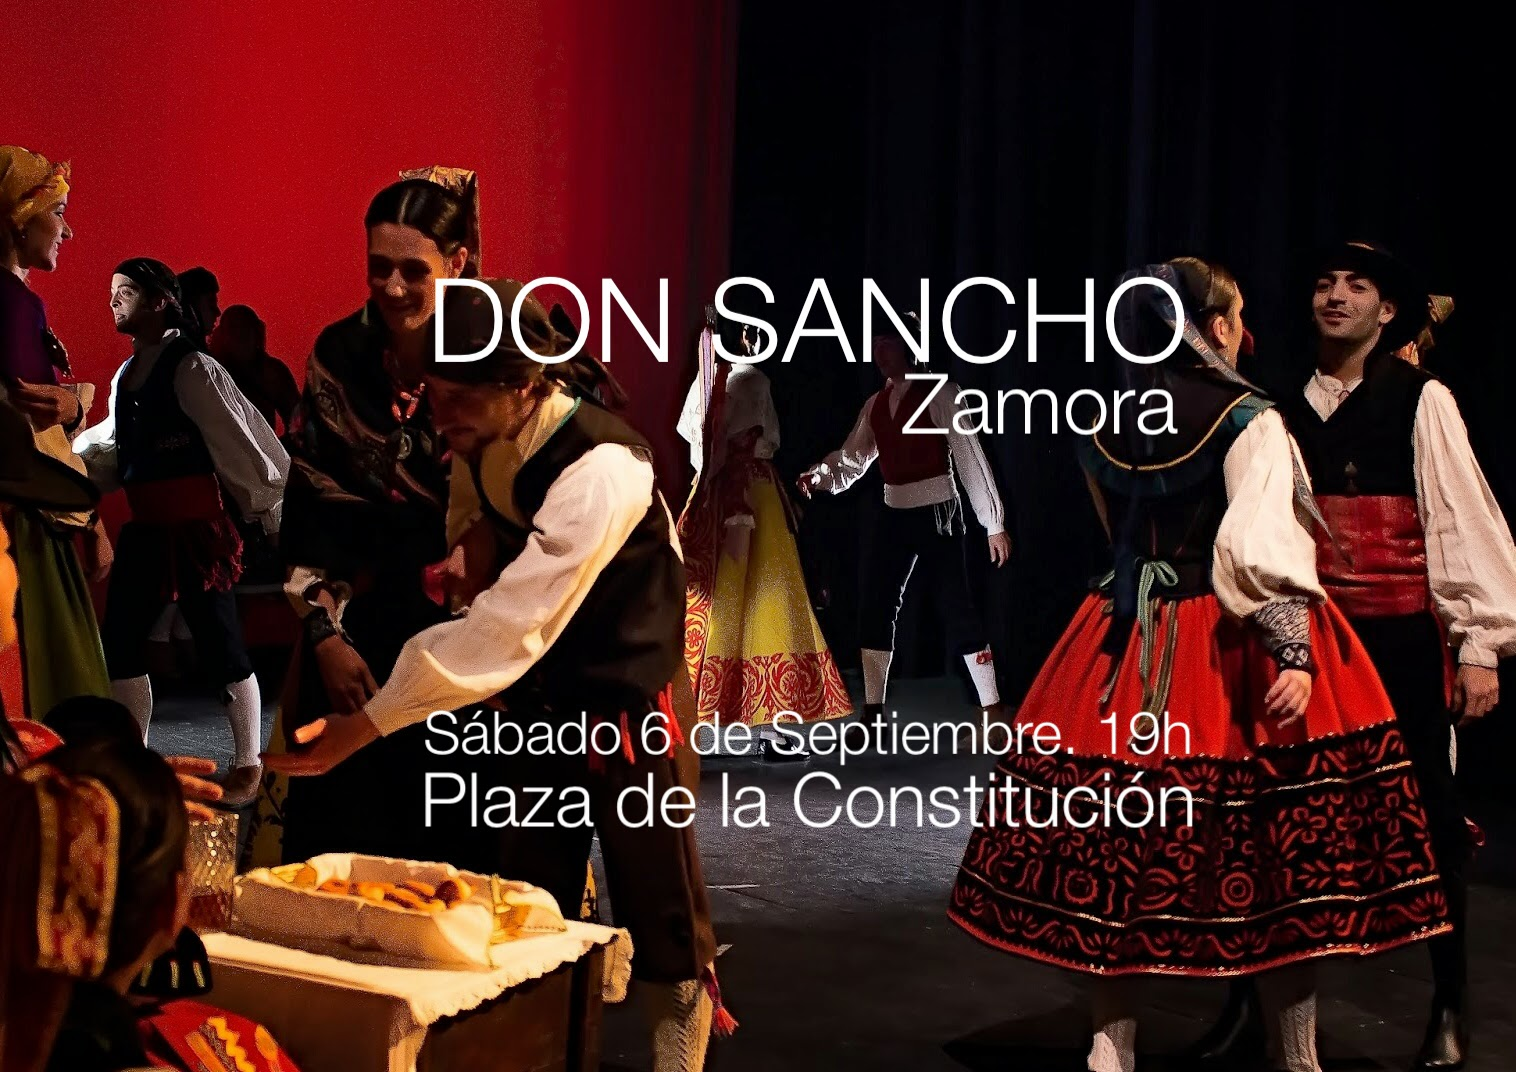 DON SANCHO. Difusión de la Cultura Tradicional de Zamora ... - photo#19